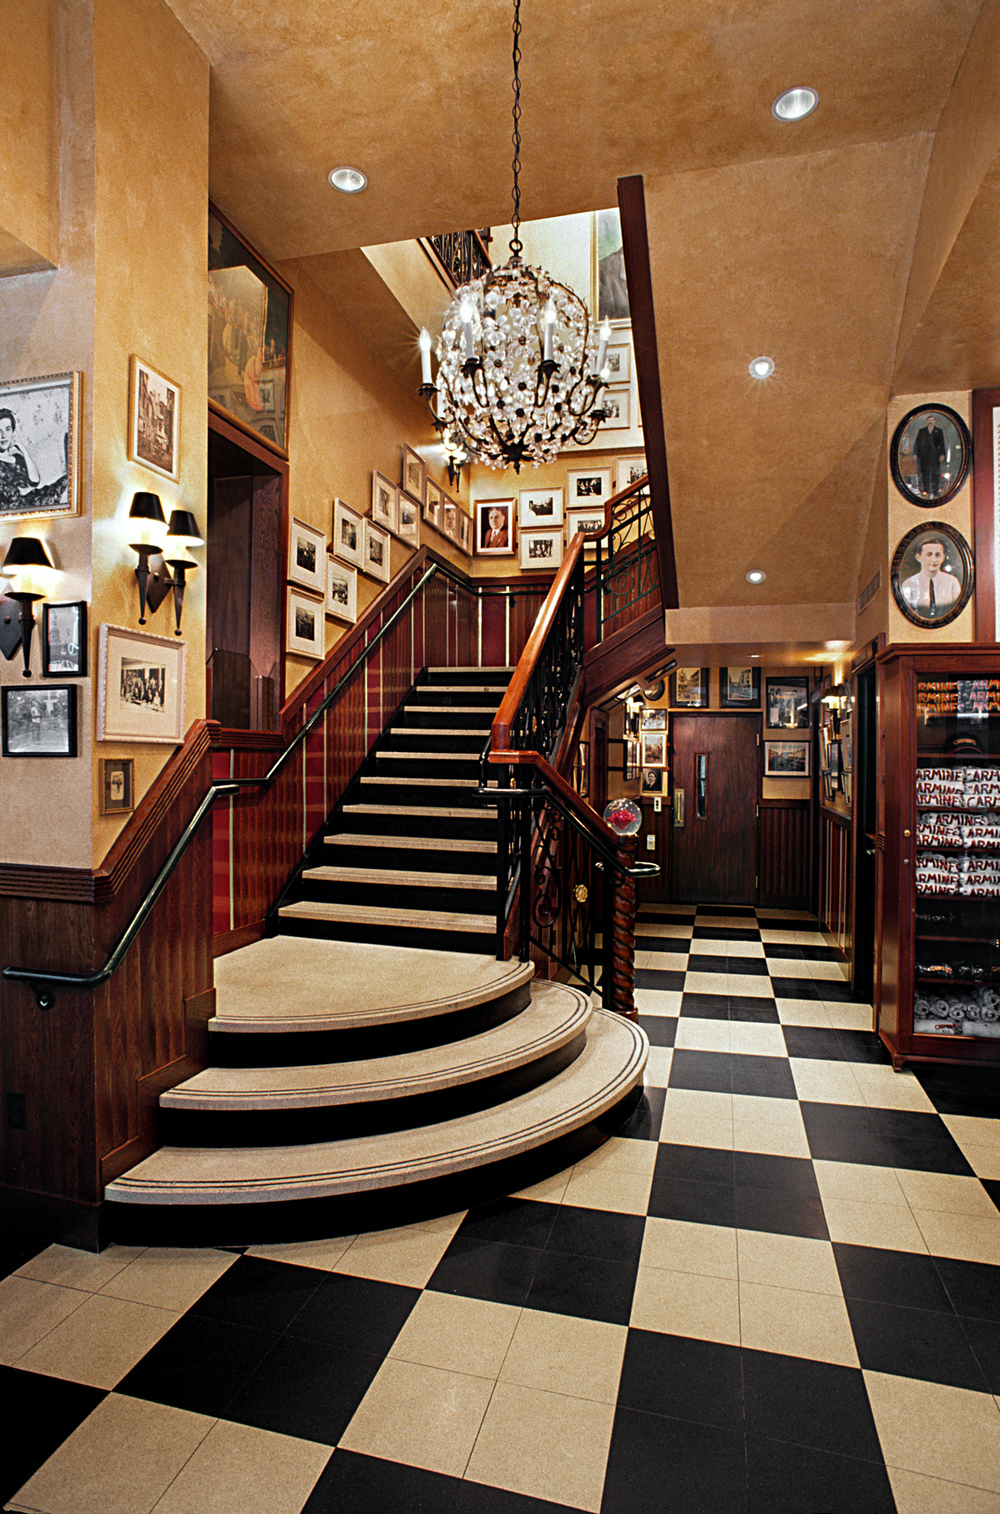 Carmine's Italian Restaurant. Tobin Parnes Design. NYC. Hospitality Design. Restaurant. Times Square. Black & White. Checker Board. Flooring. Millwork. Staircase.